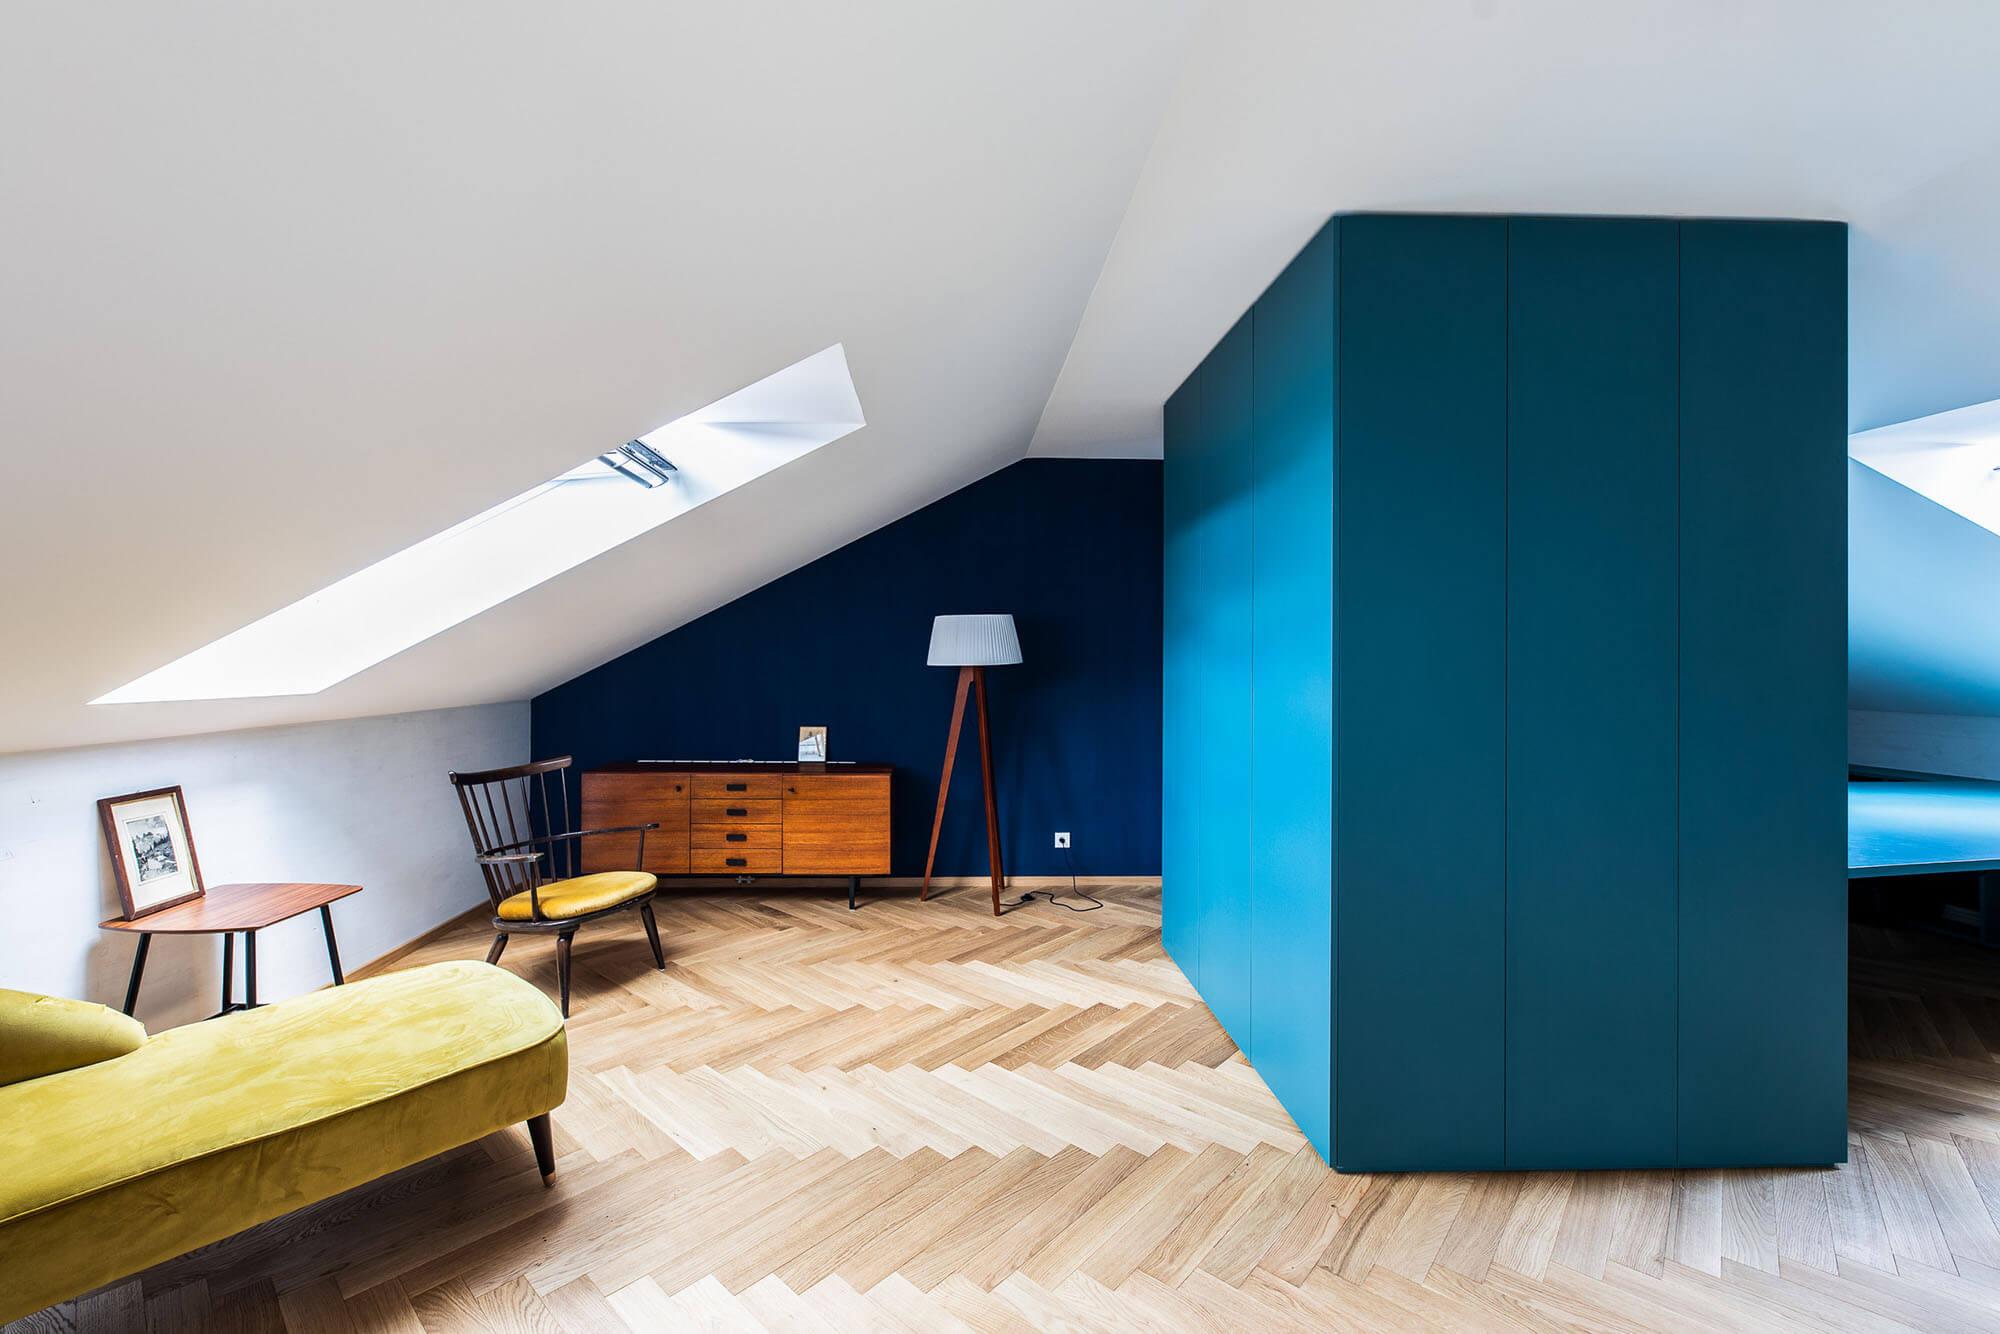 roomart design wood floor boden tischler product photography produktfotografie flap photography fotograf philipp greindl photographer linz austria